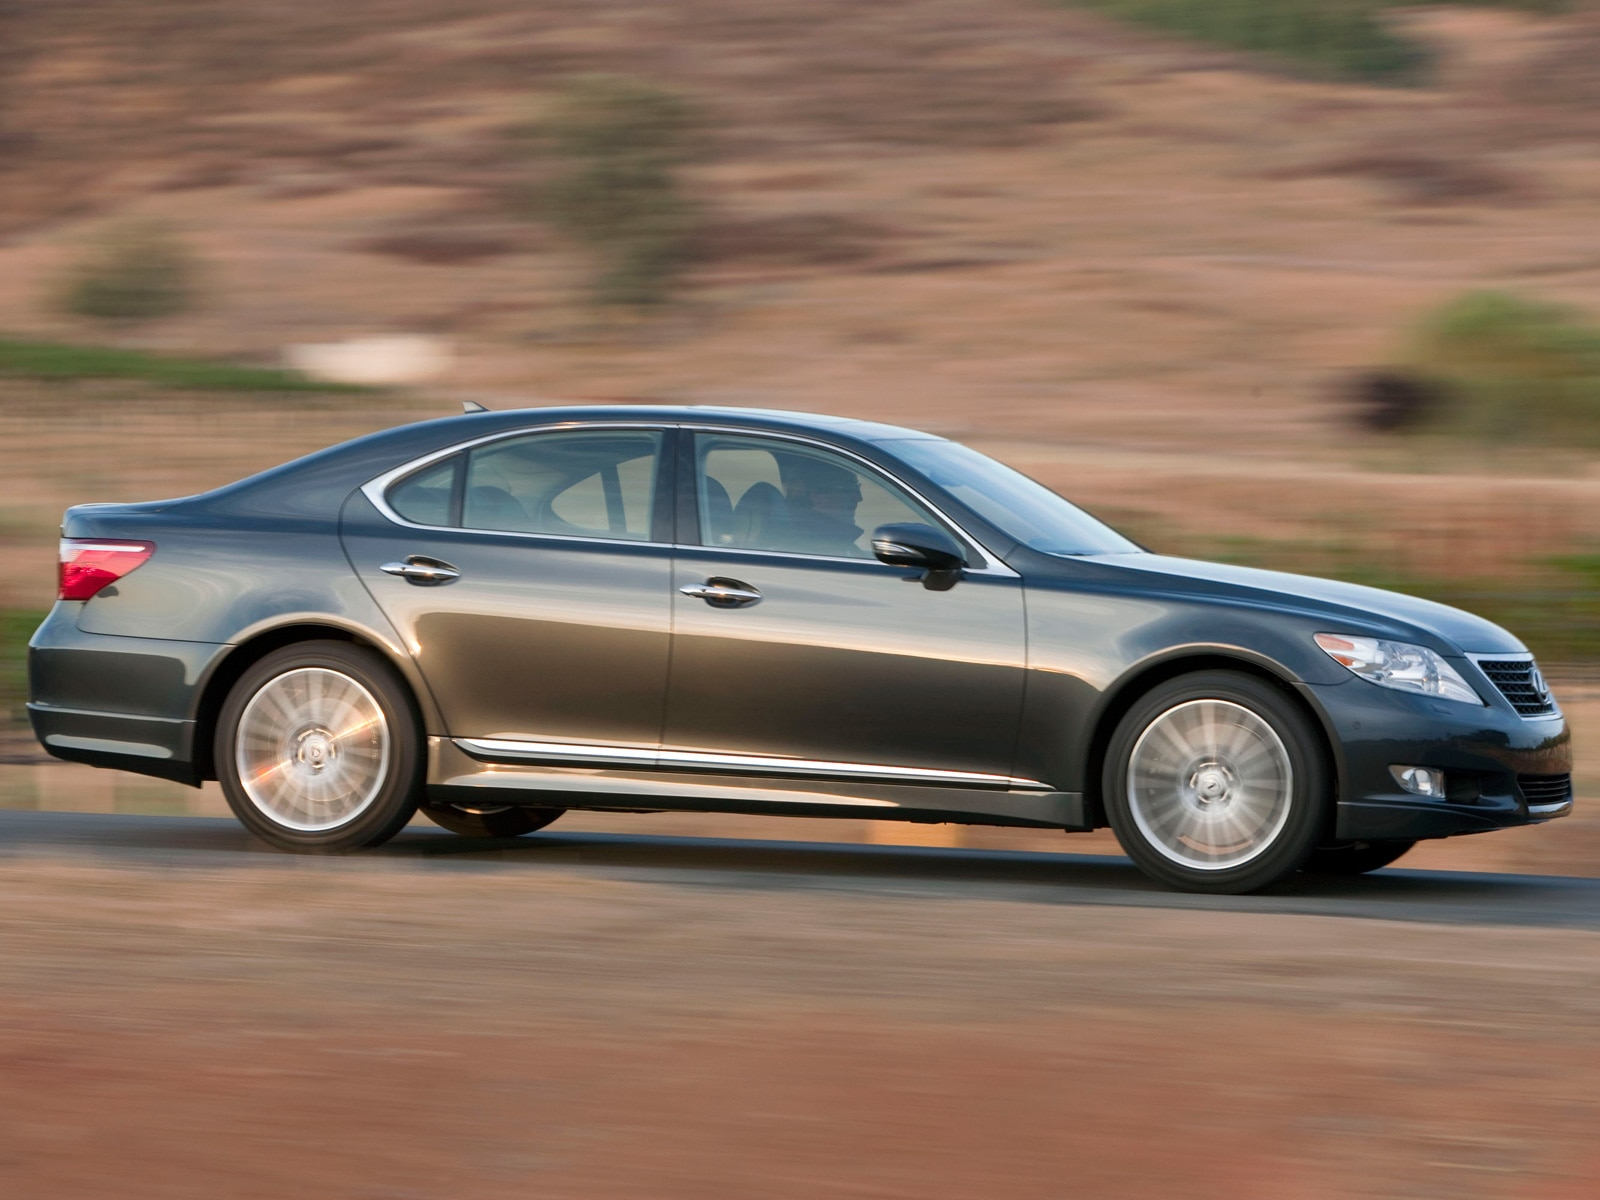 https://st.automobilemag.com/uploads/sites/11/2009/11/0911_05_z-2010_lexus_lS_460_sport-side_view.jpg